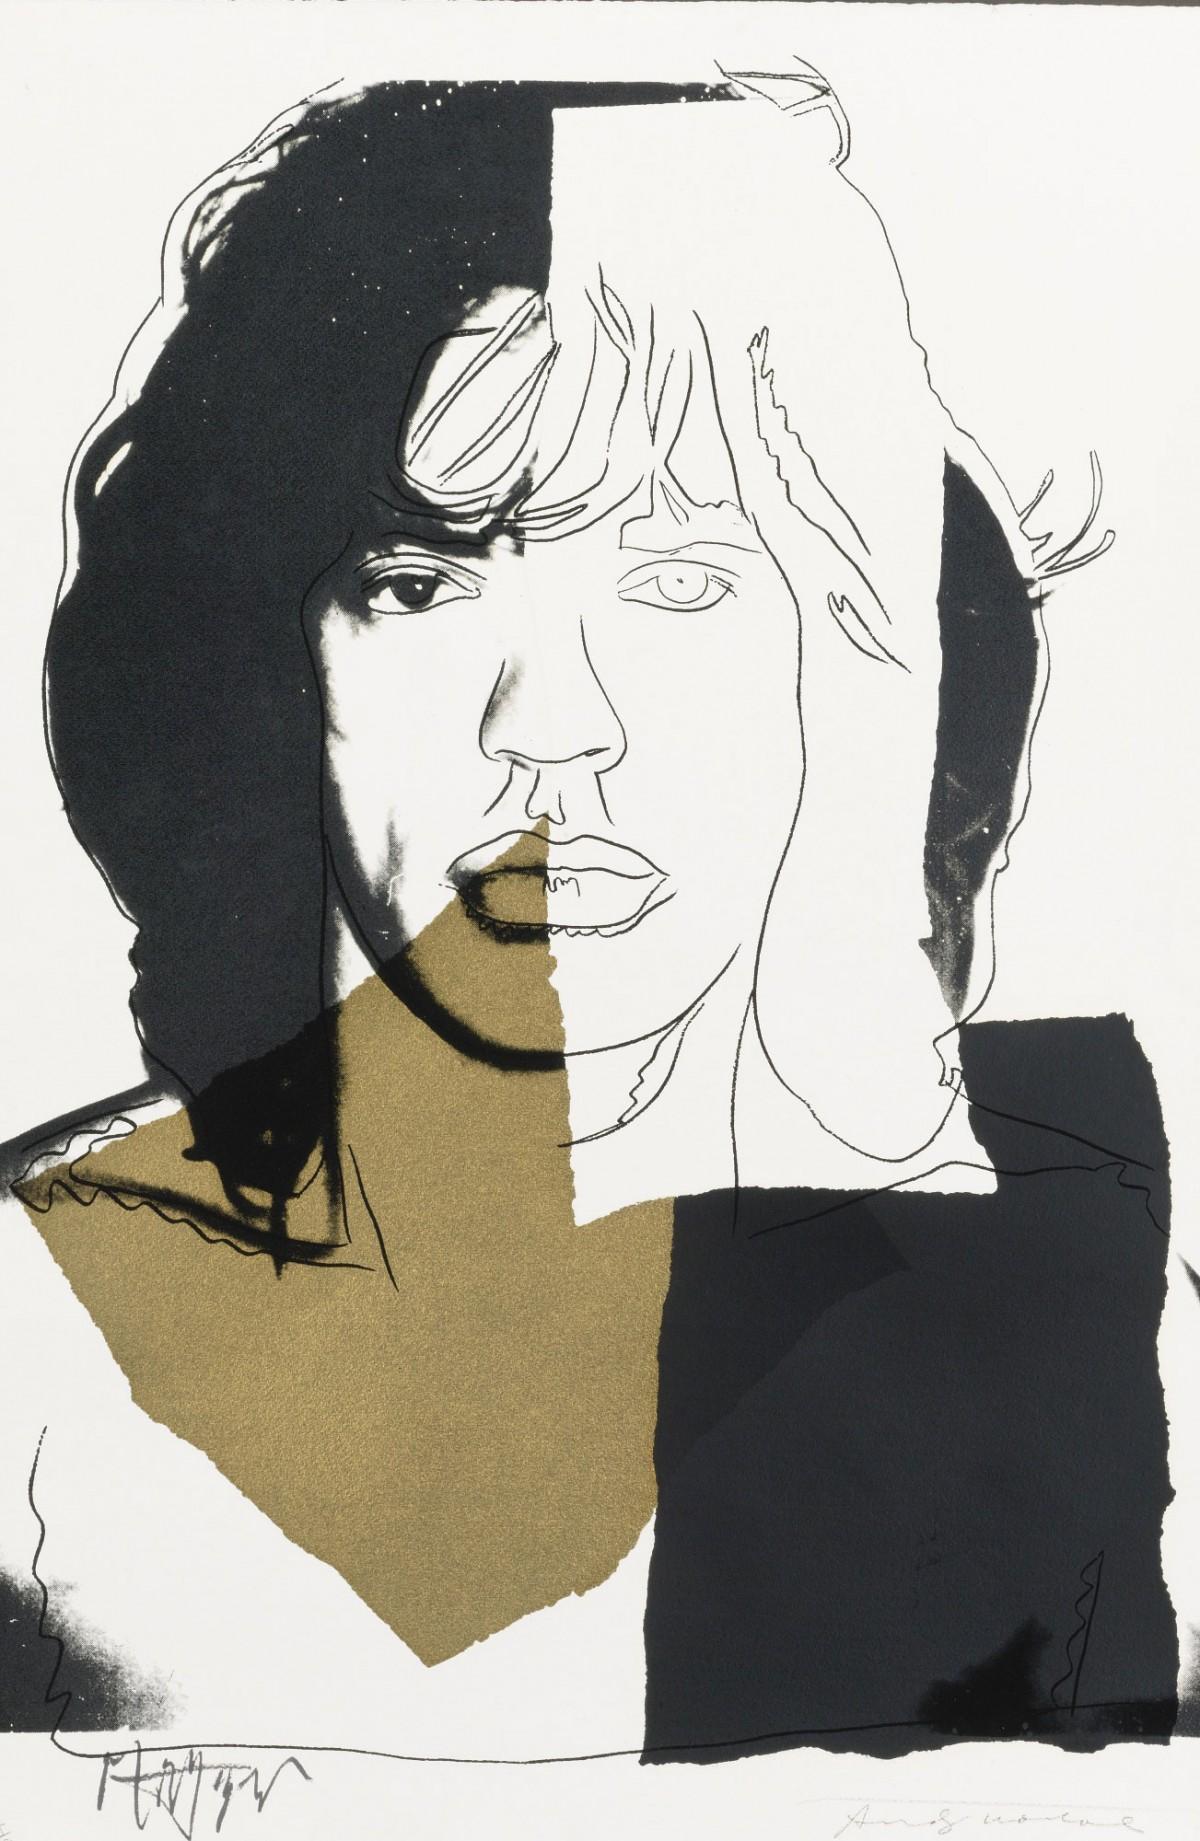 Mick Jagger (fs Ii.146) by Andy Warhol